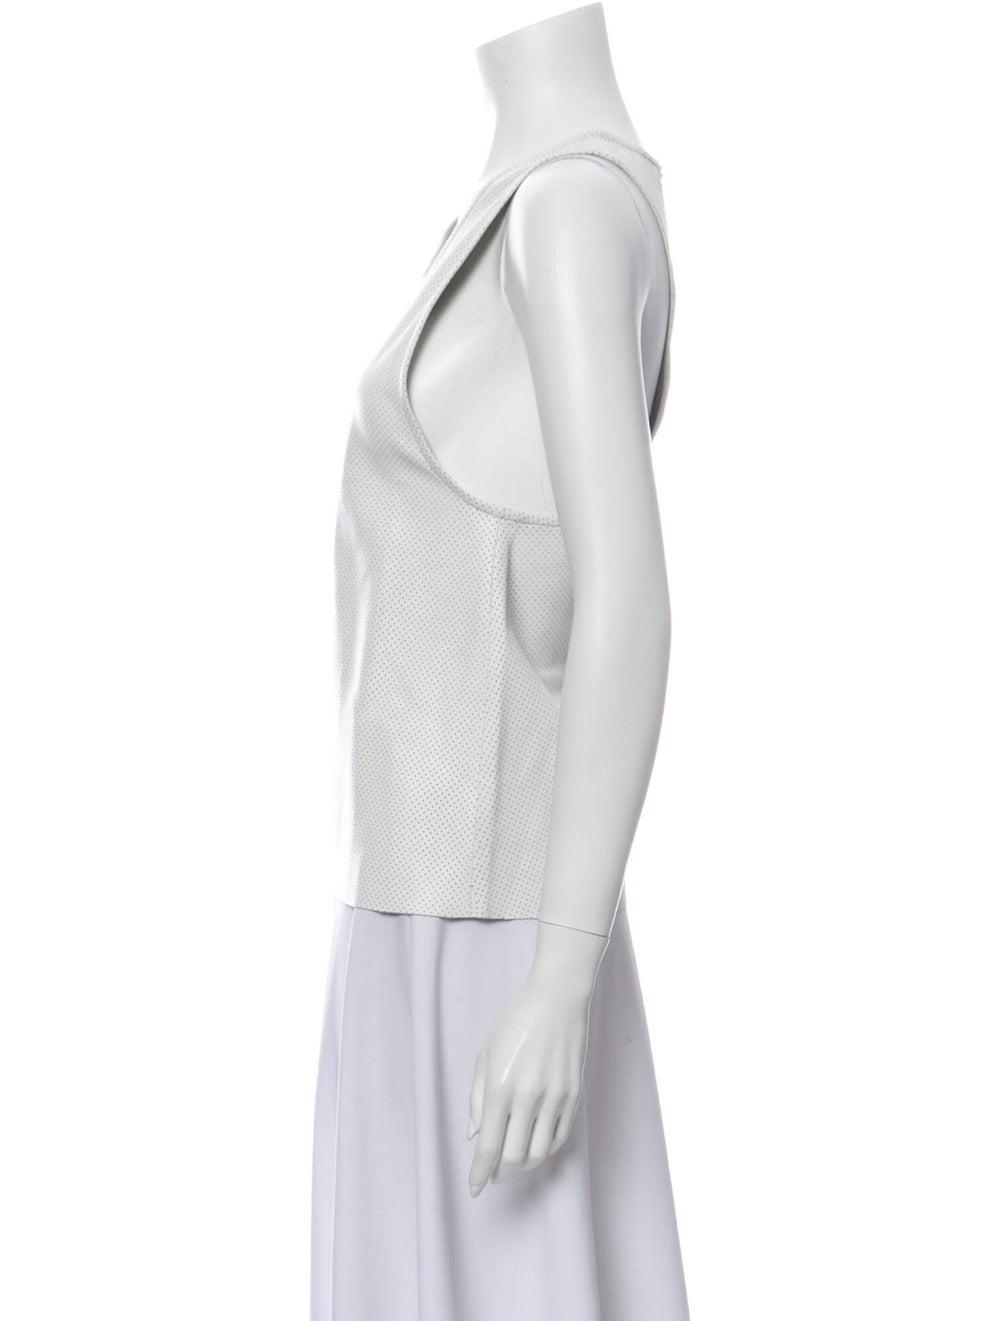 Anine Bing Scoop Neck Sleeveless Top White - image 2